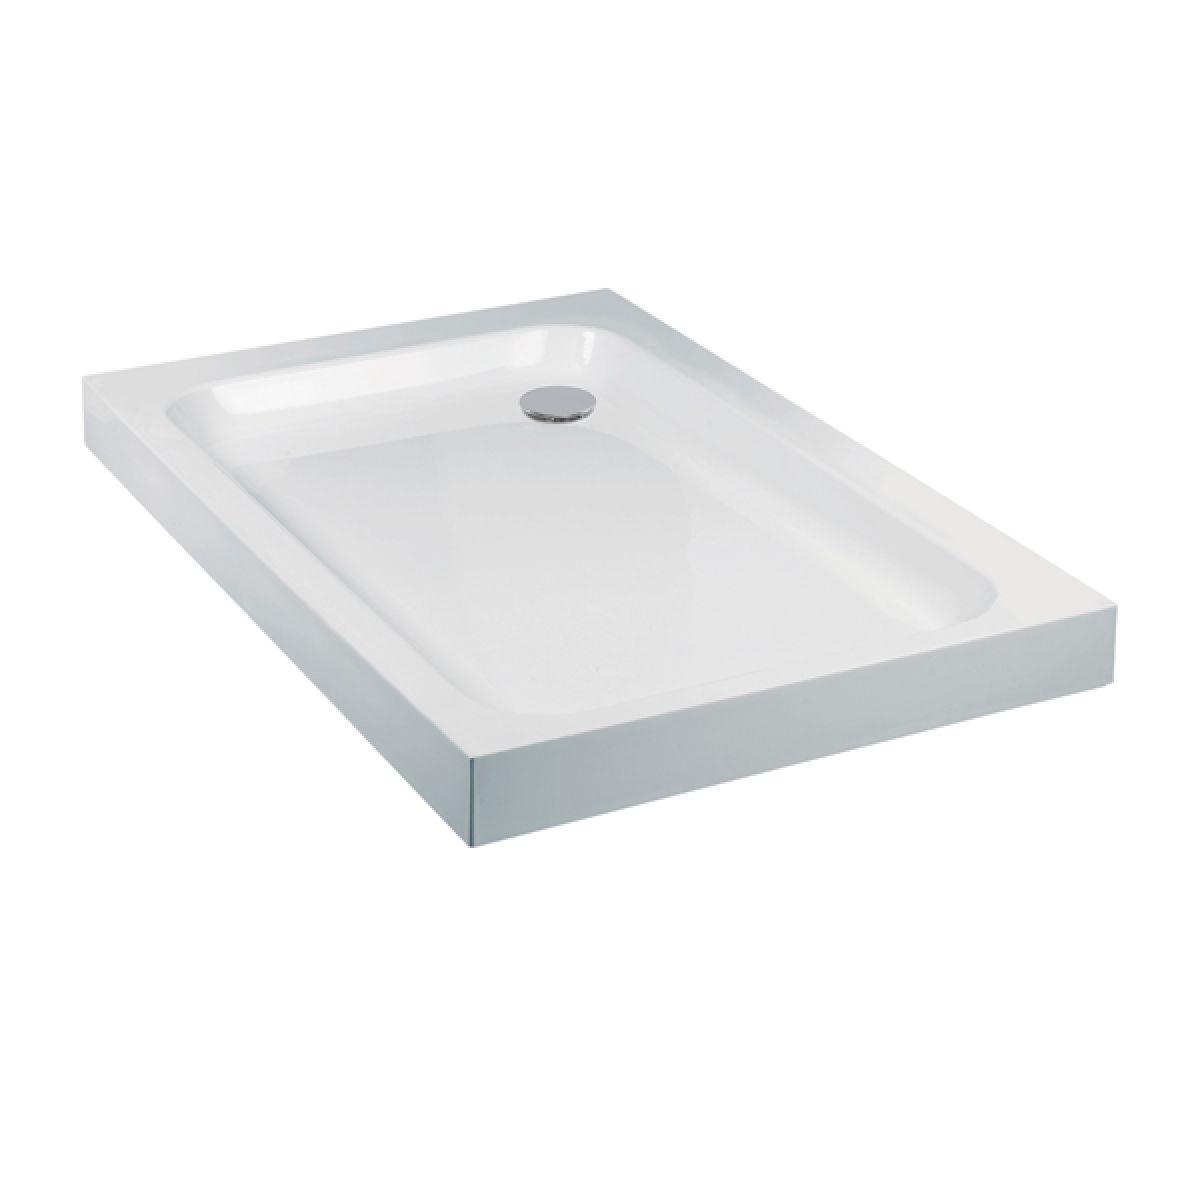 Frontline Standard Rectanglular Shower Tray 1700 x 700mm